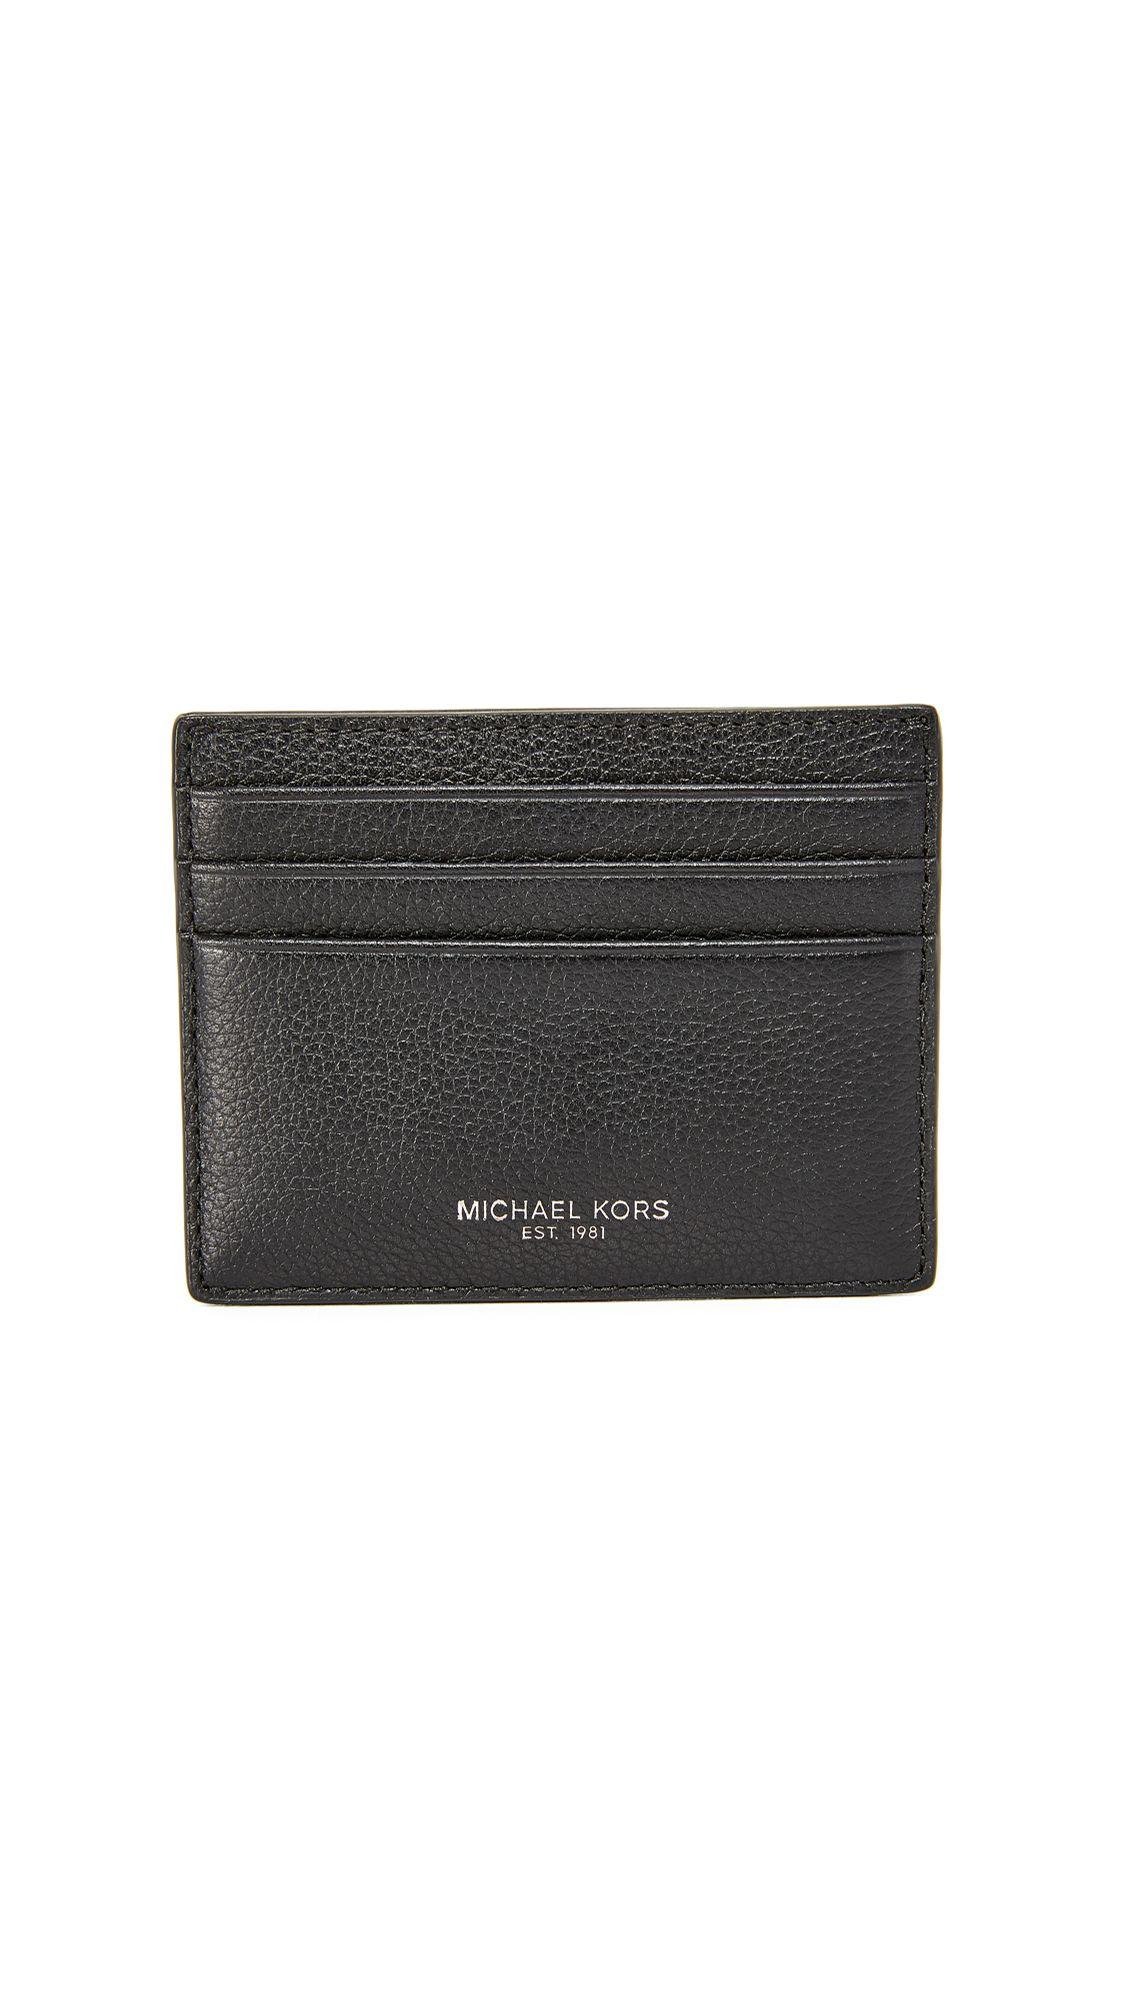 2c30eb5041 MICHAEL KORS Bryant Pebbled Leather Tall Card Case. #michaelkors #case